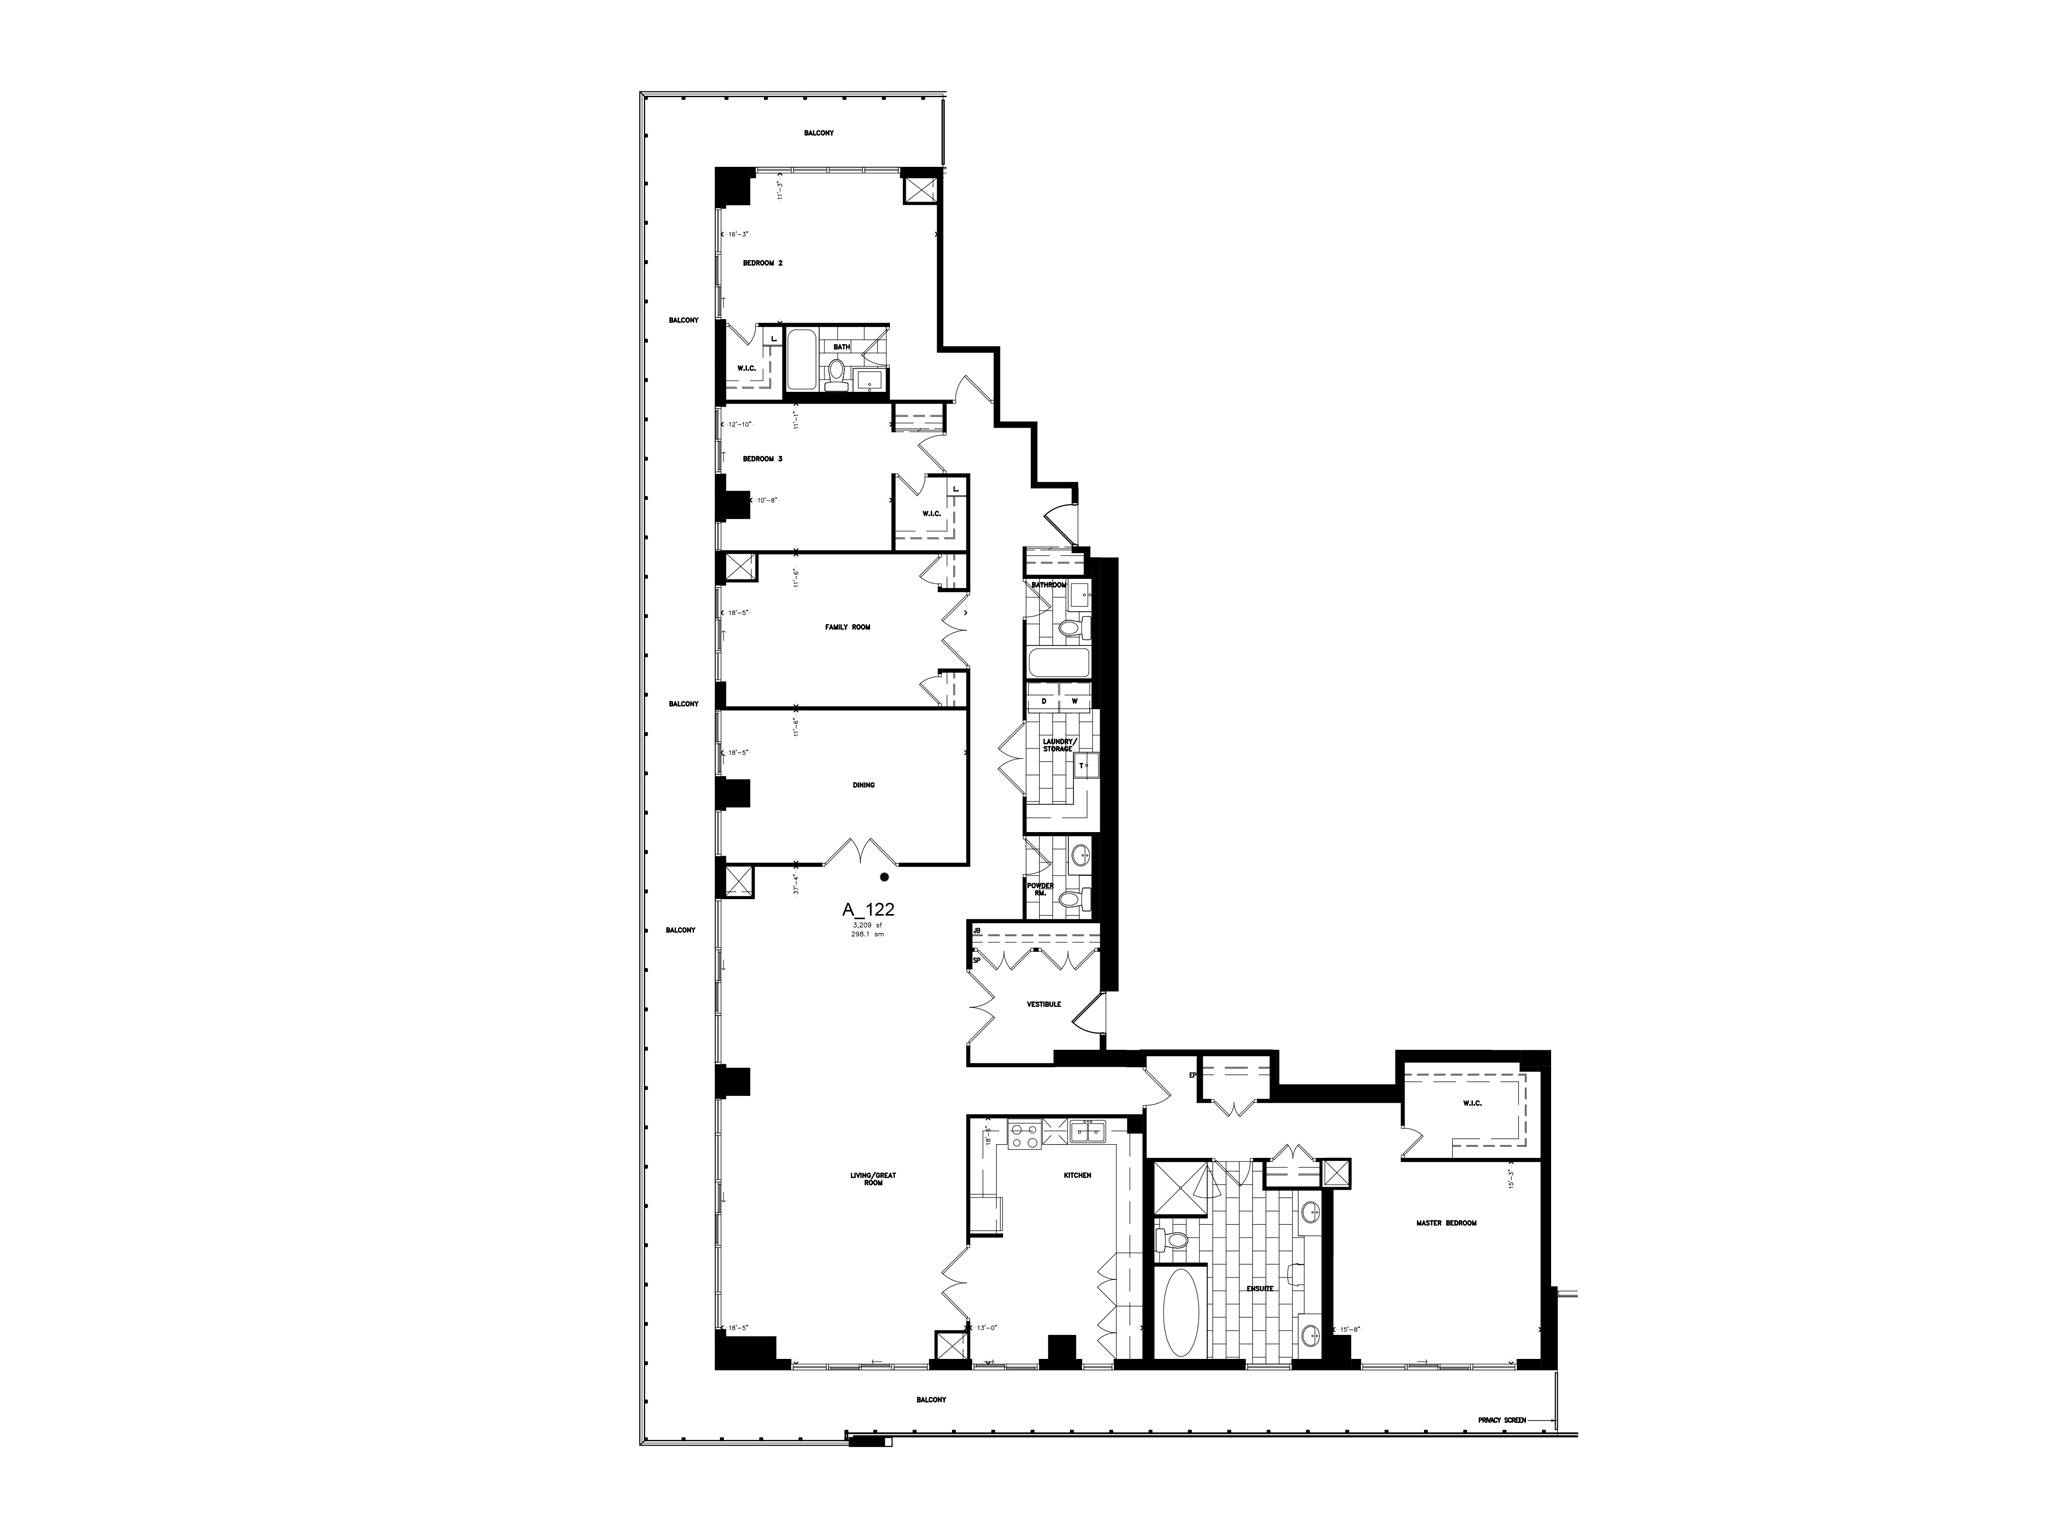 35671-ph01a_floor-plan-carribbean